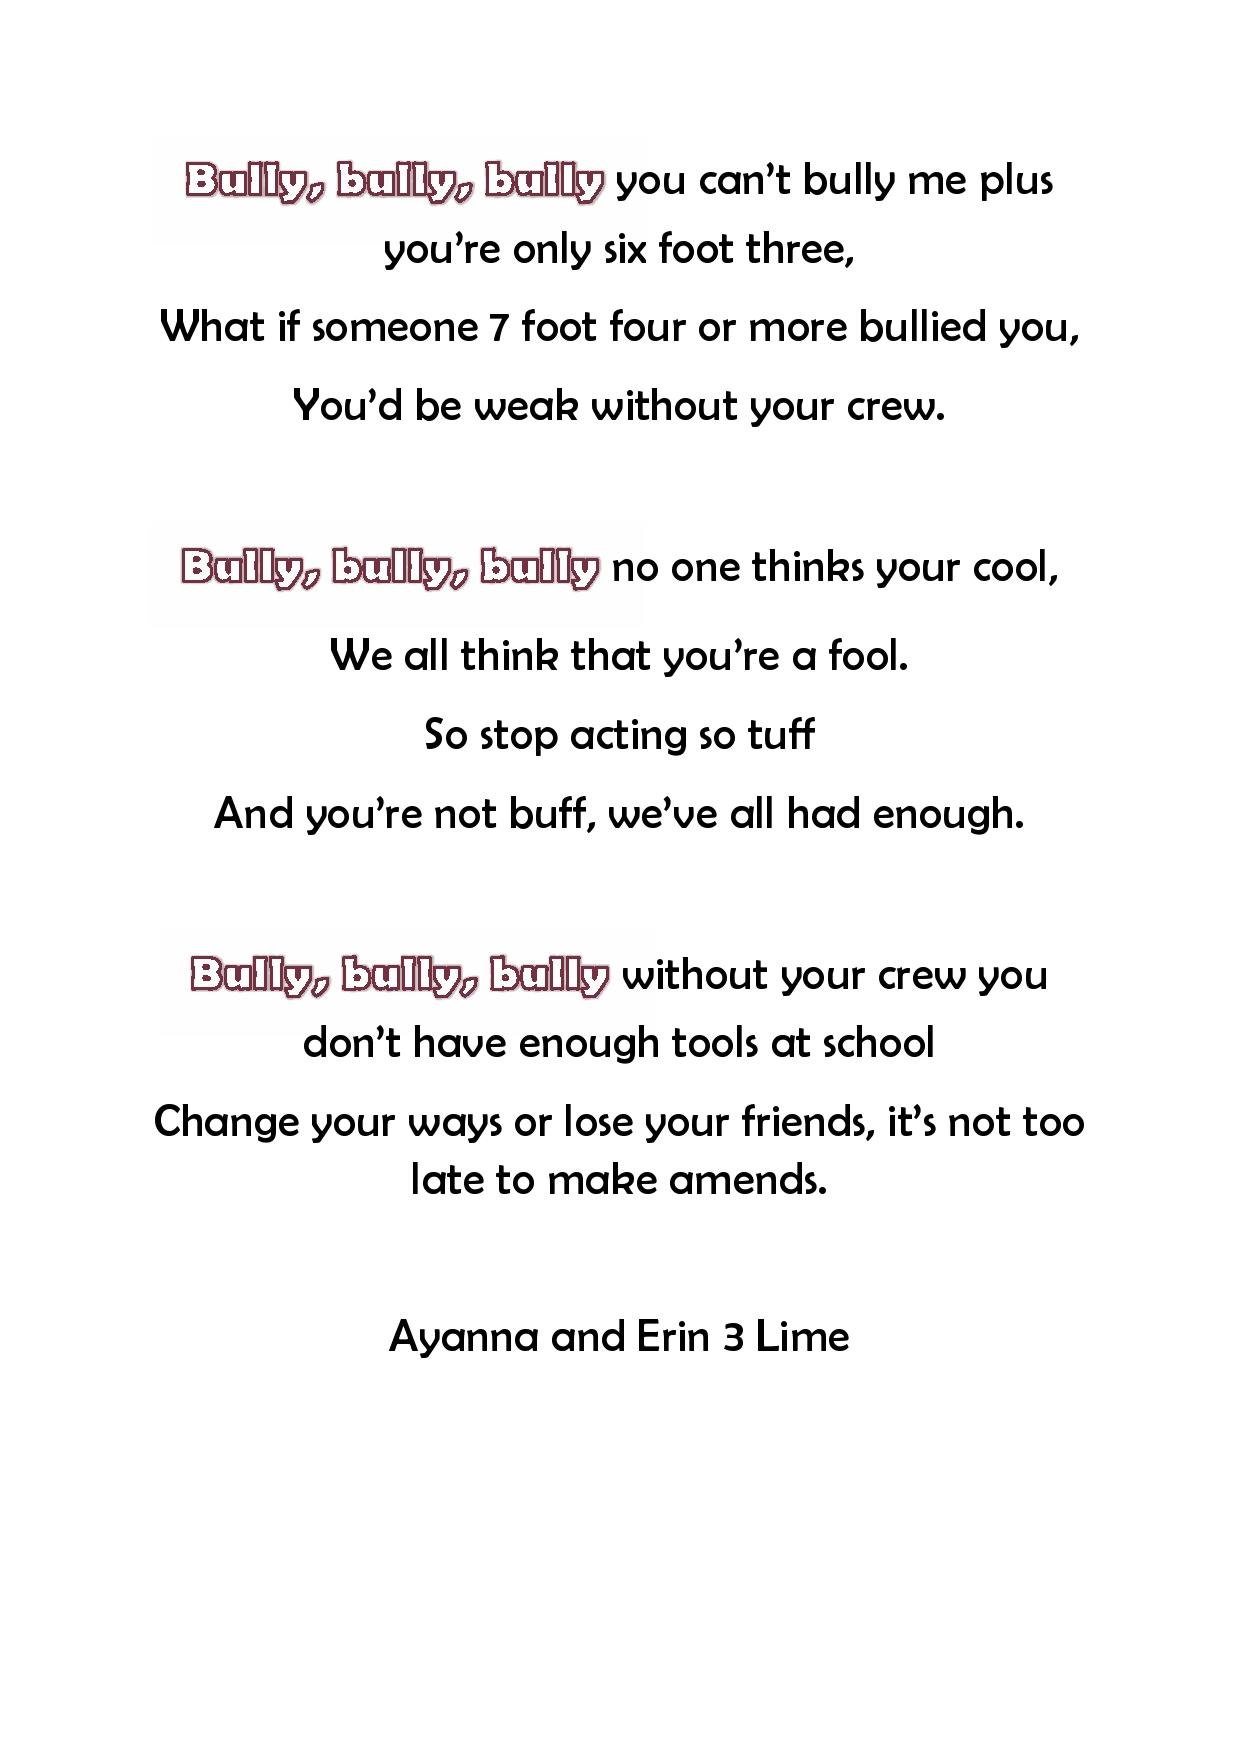 bully bully bully Ayanna and Erin 3 Lime-page0001.jpg